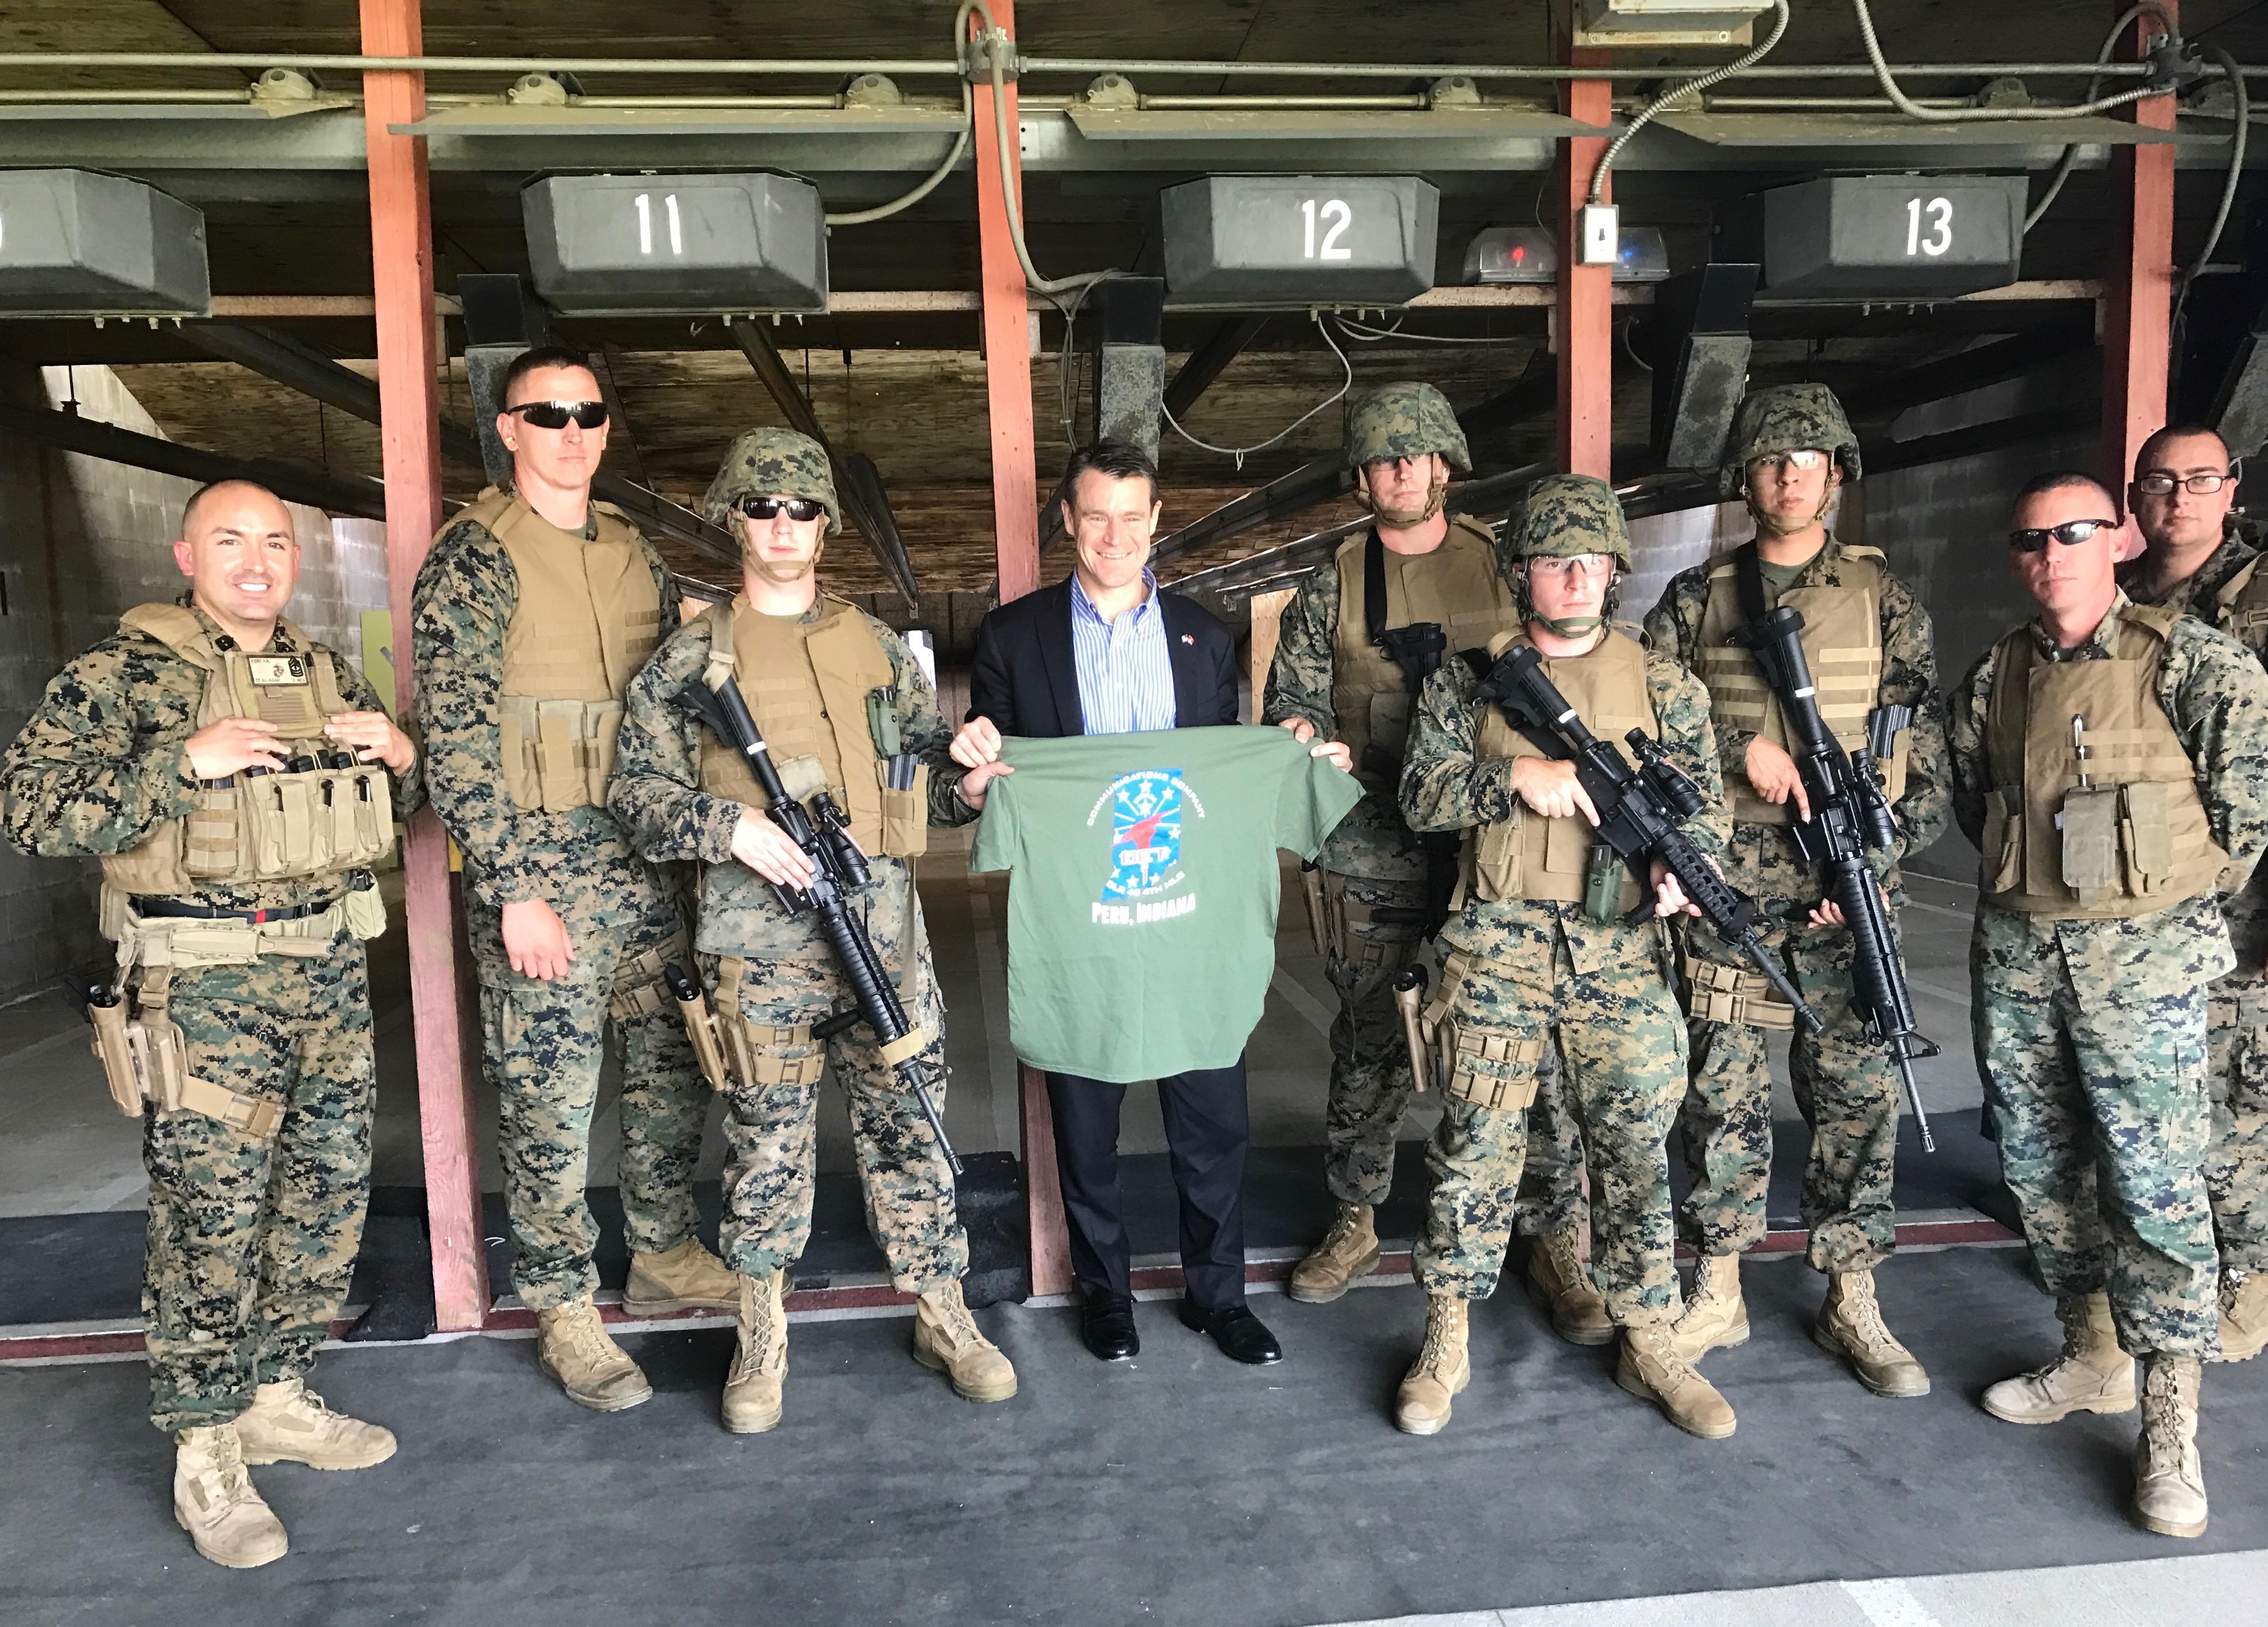 Young Visits Key Indiana Military Bases 4